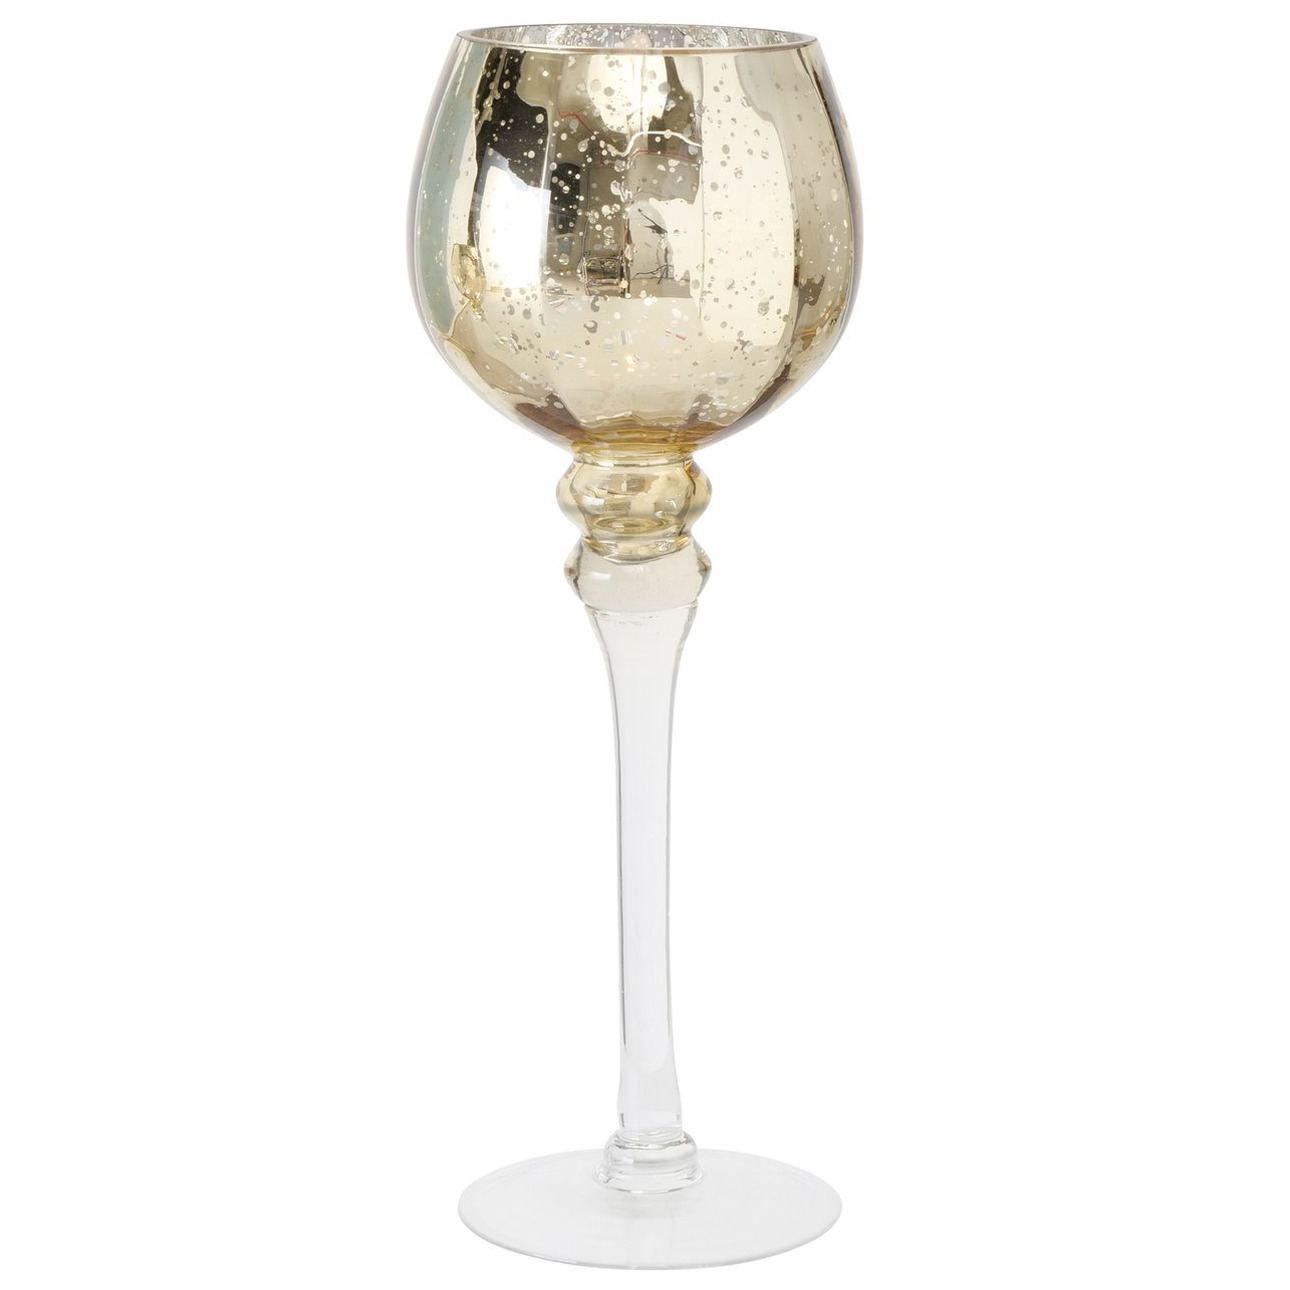 Luxe glazen design kaarsenhouder-windlicht metallic goud transparant 35 cm